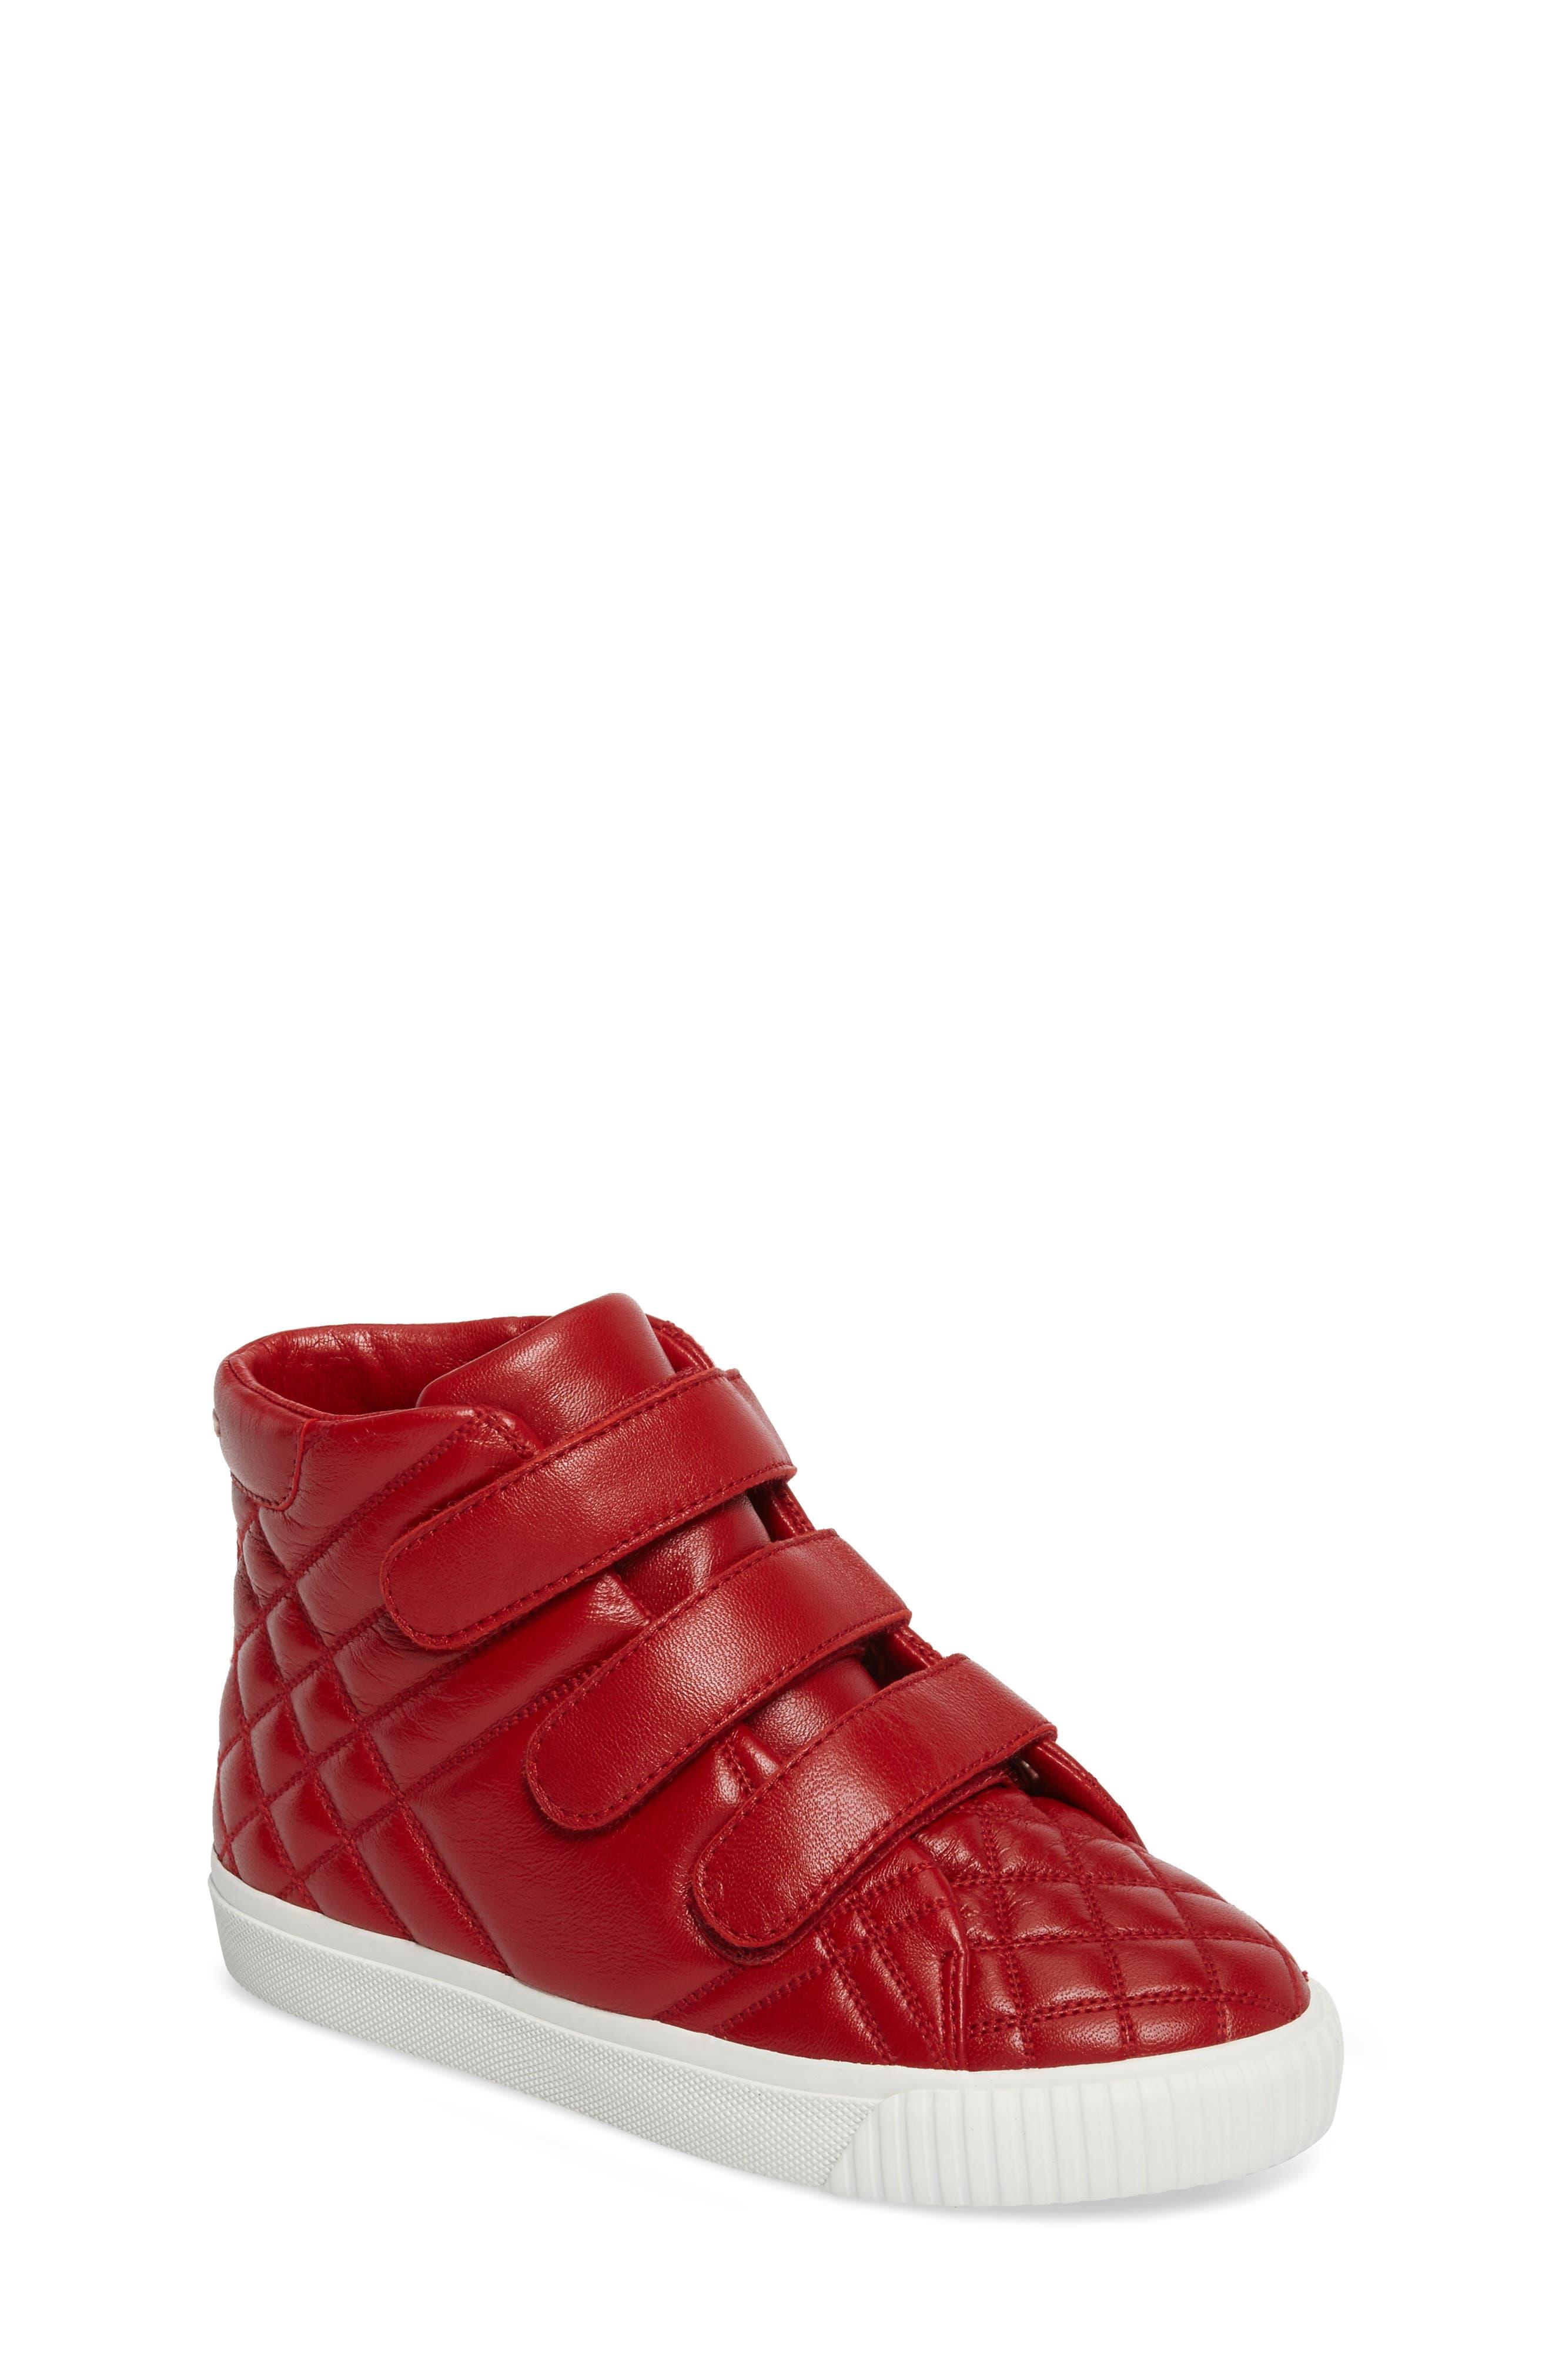 Burberry Sturrock Quilted High Top Sneaker (Walker, Toddler, Little Kid & Big Kid)